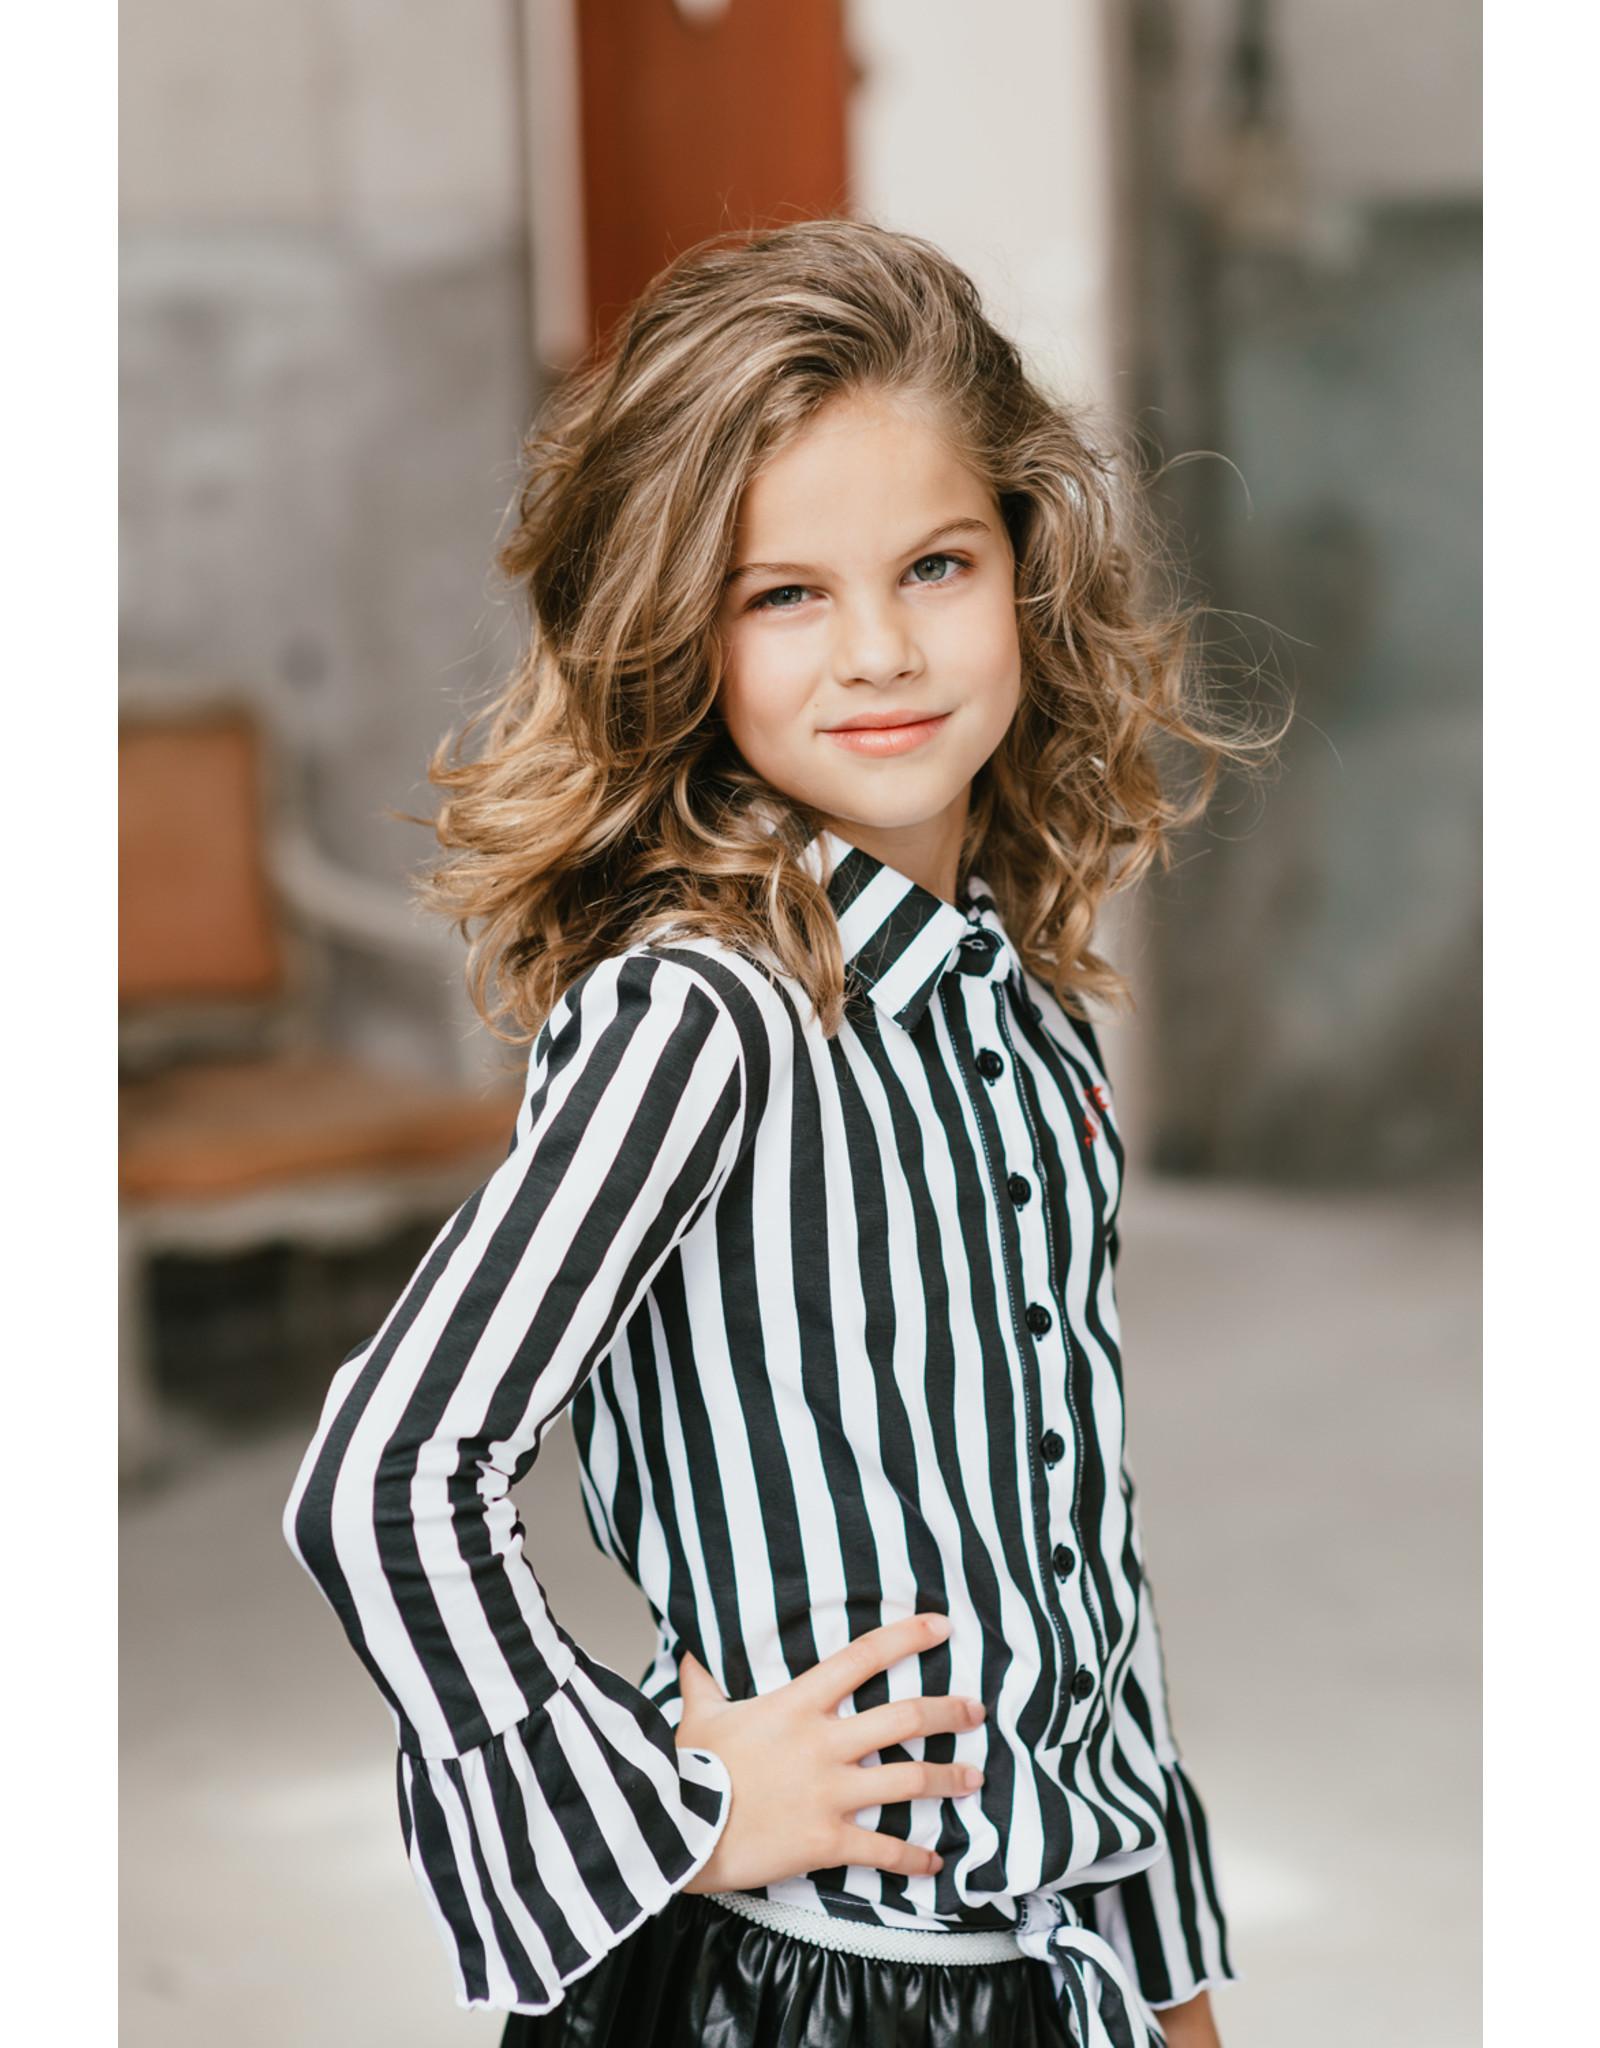 Topitm TOPitm blouse Tara stripe